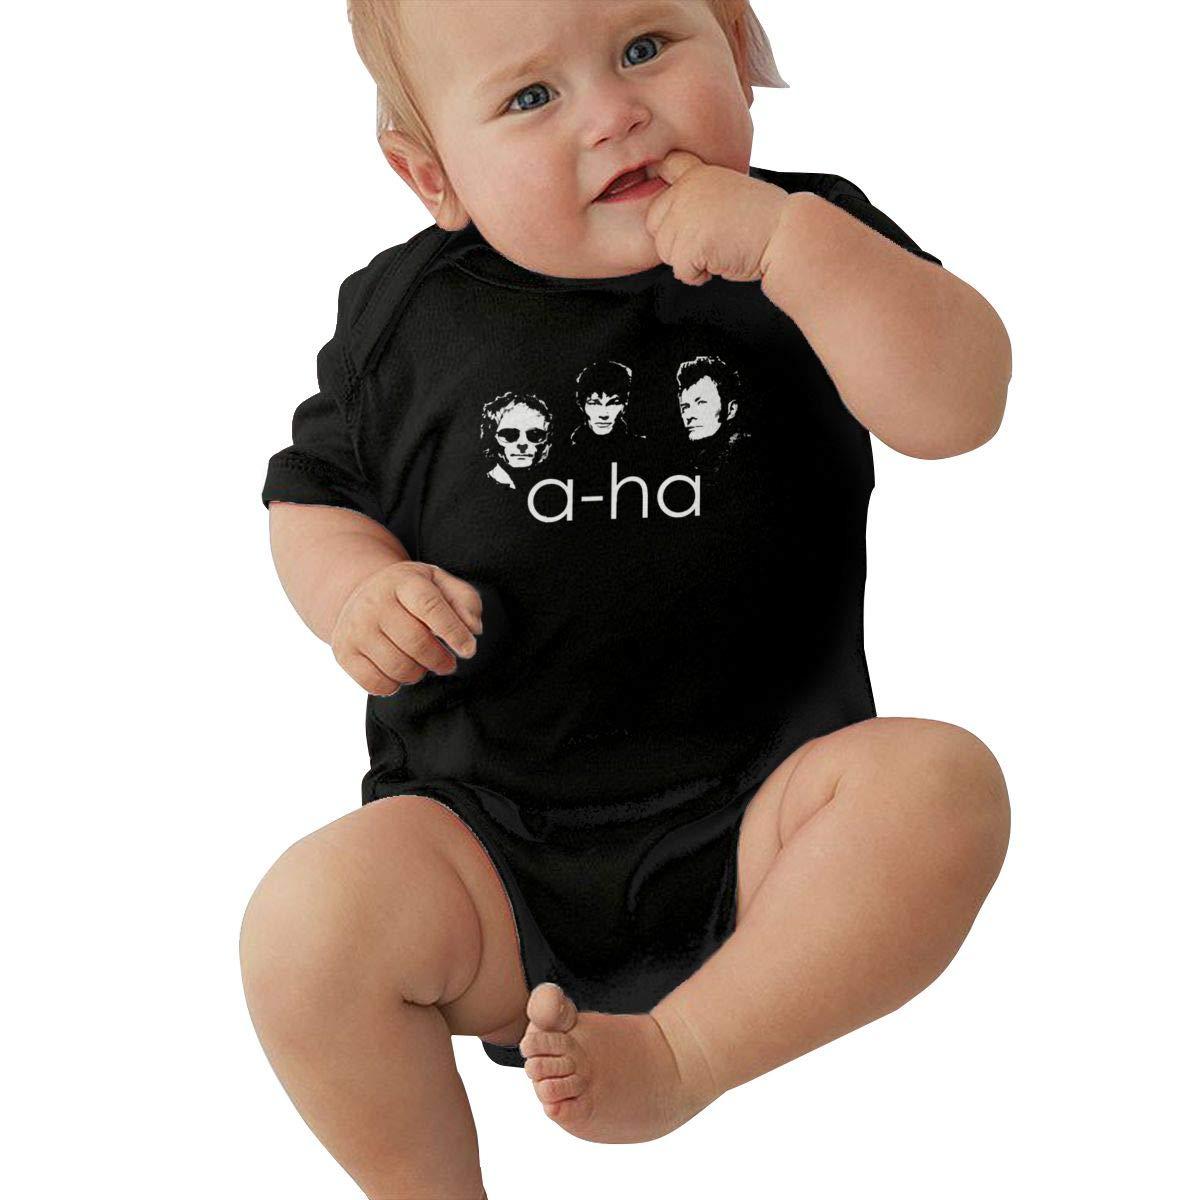 SusanHuling A-ha Unisex Baby Boys Girls Romper Bodysuit Infant Funny Jumpsuit